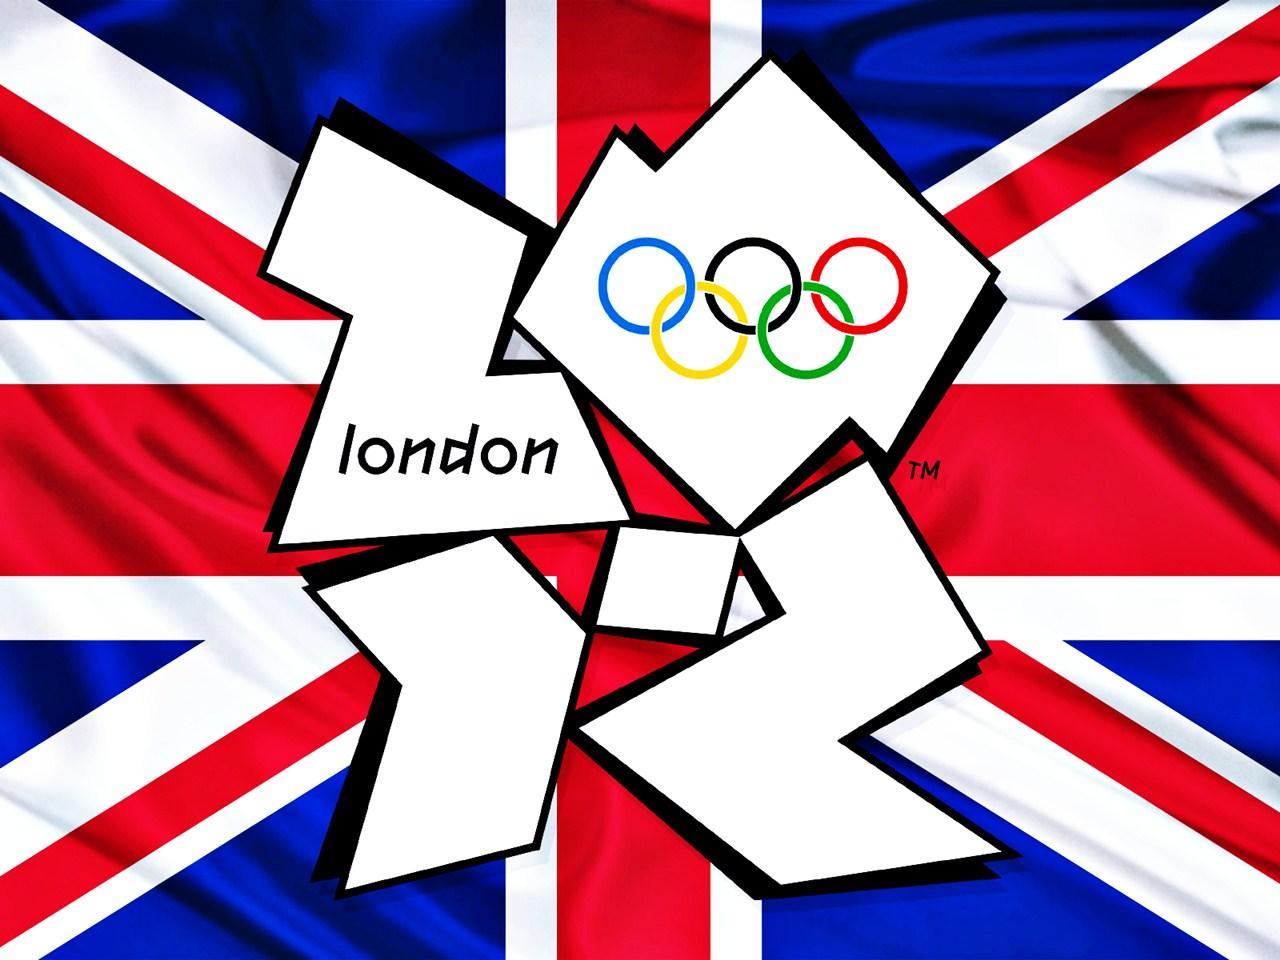 olympics games 2012